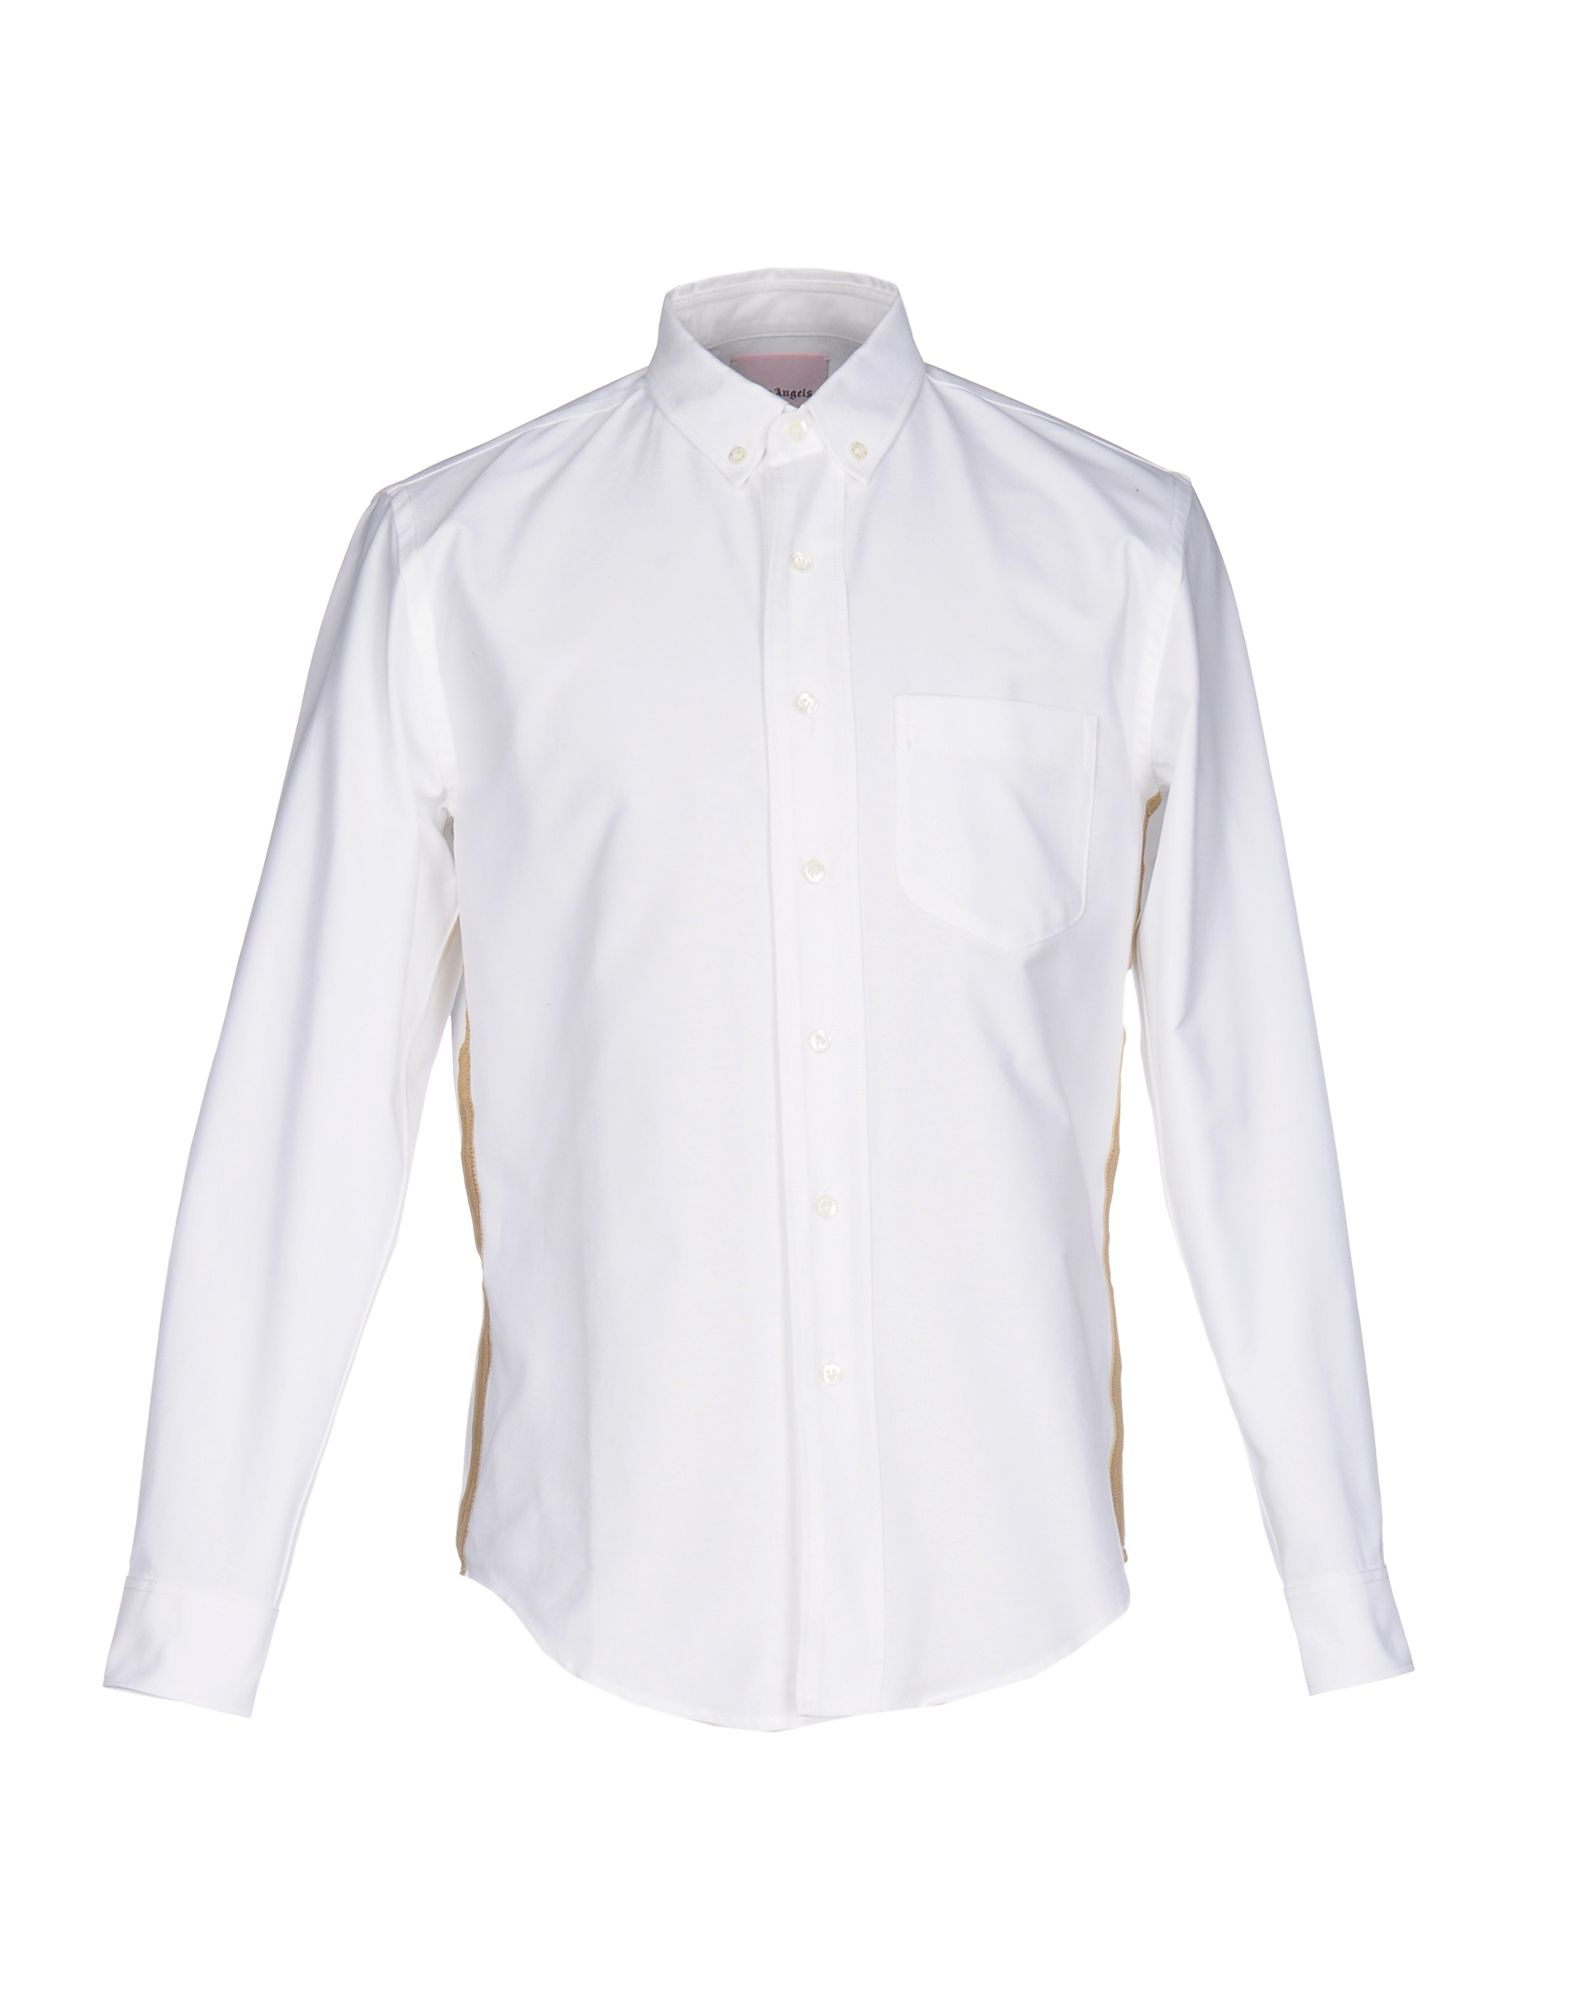 Camicia Tinta Unita Palm Angels Uomo - Acquista online su